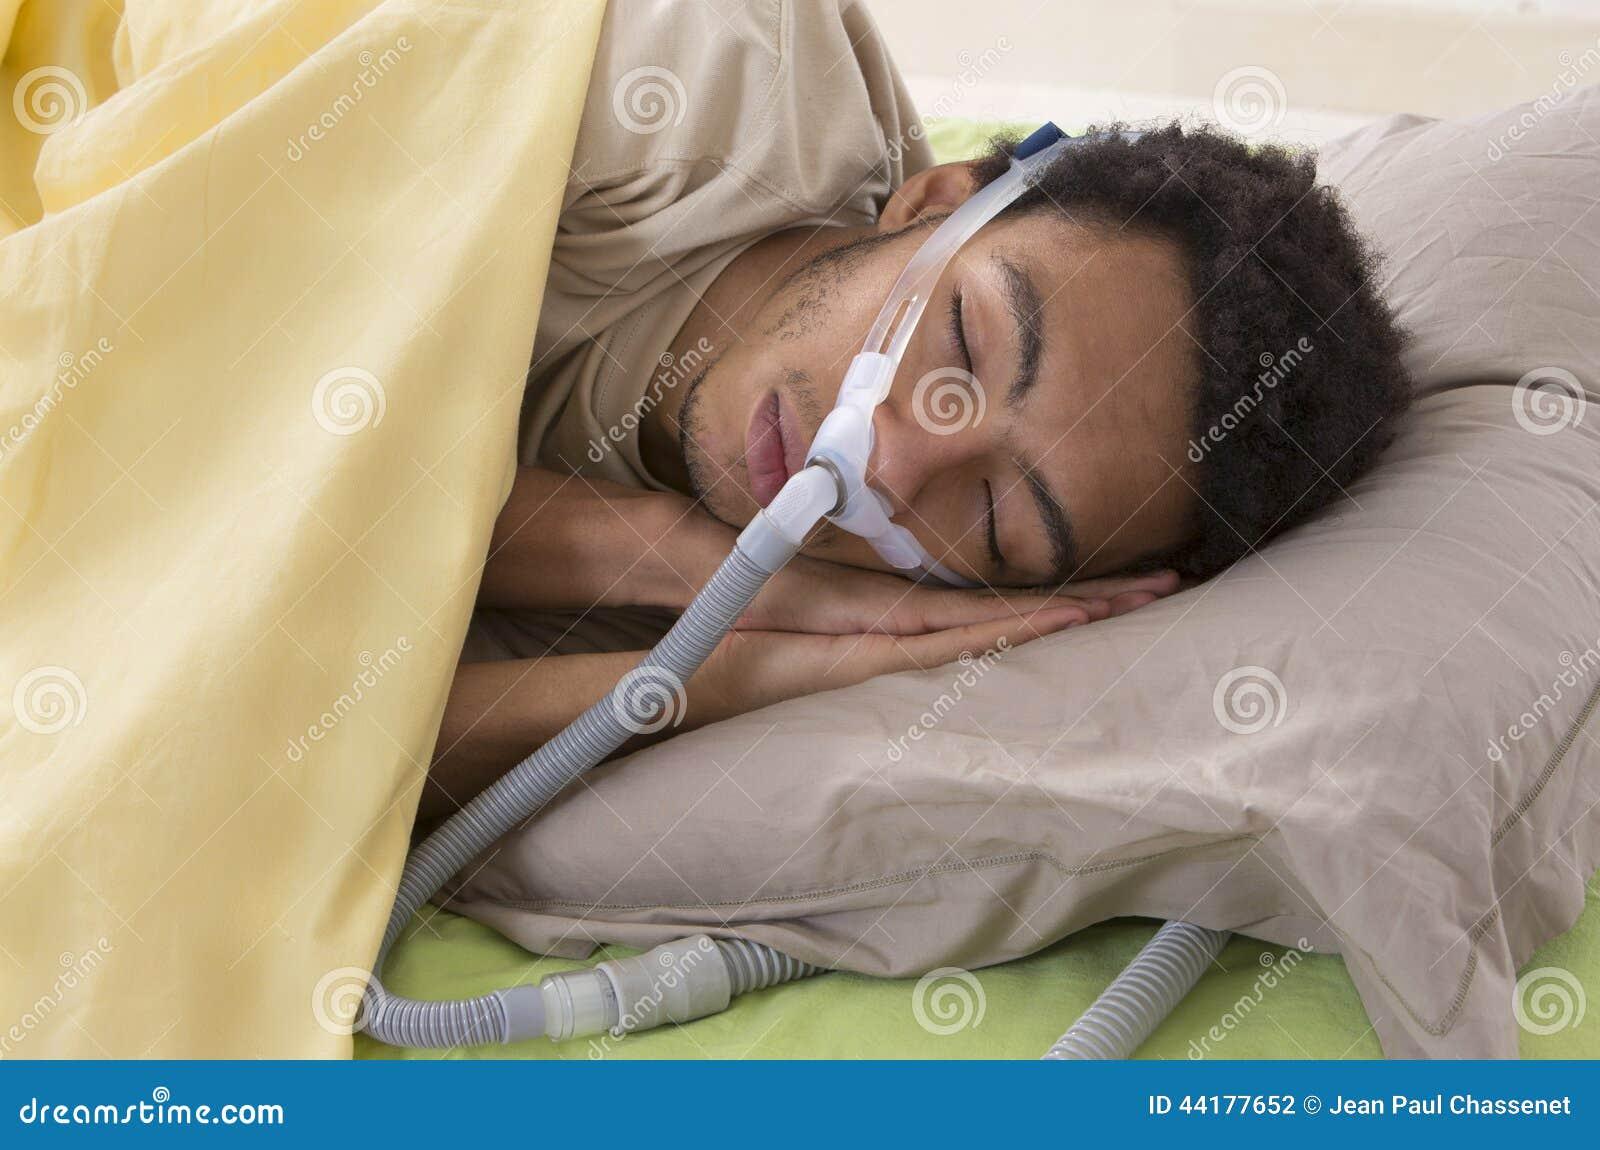 sleep apnea machine settings